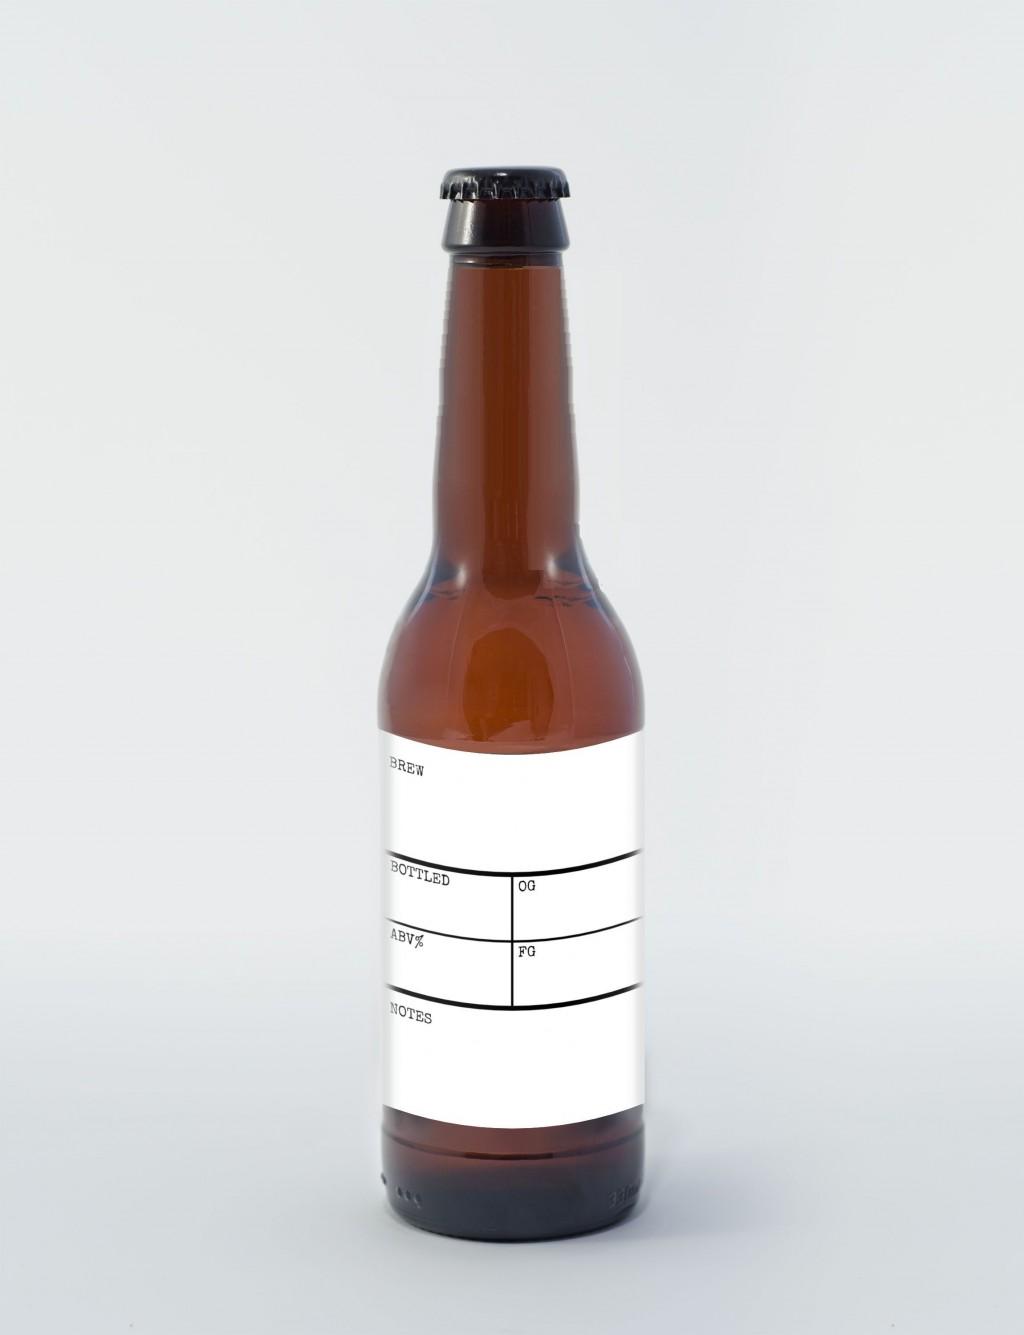 005 Outstanding Beer Bottle Label Template Inspiration  Free Dimension WordLarge